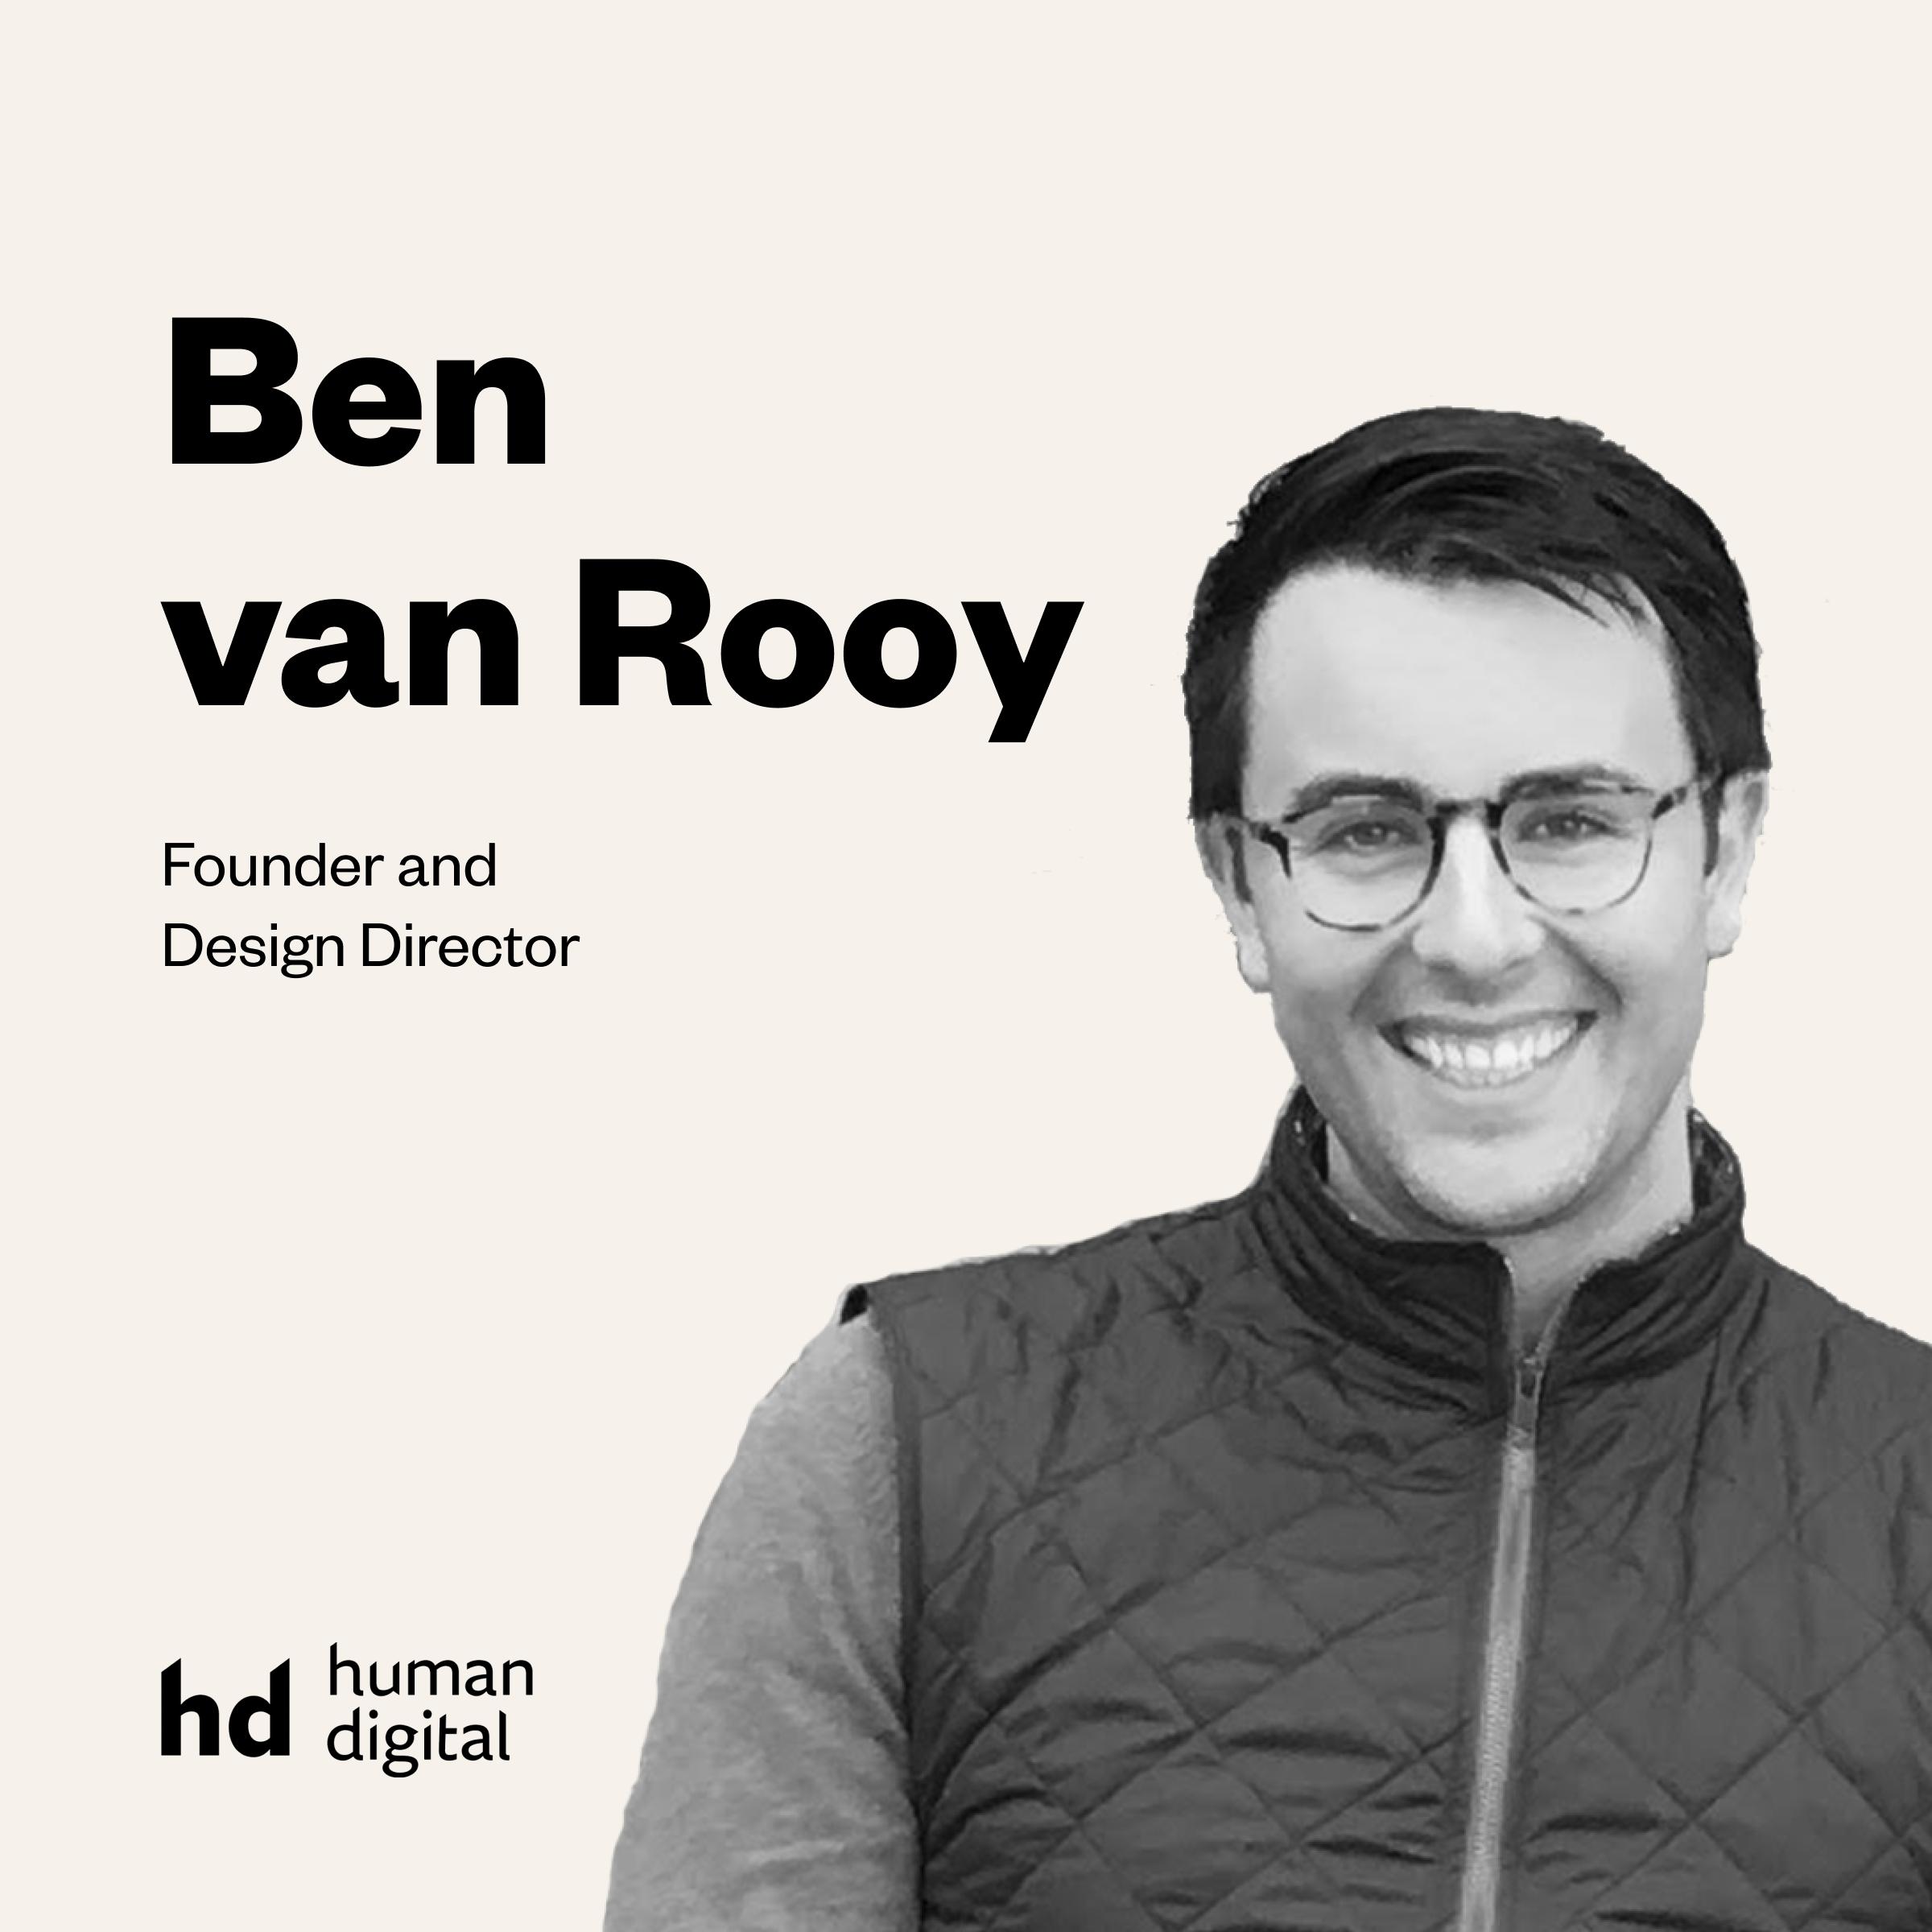 Meet Ben, Founder and Design Director at Human Digital.